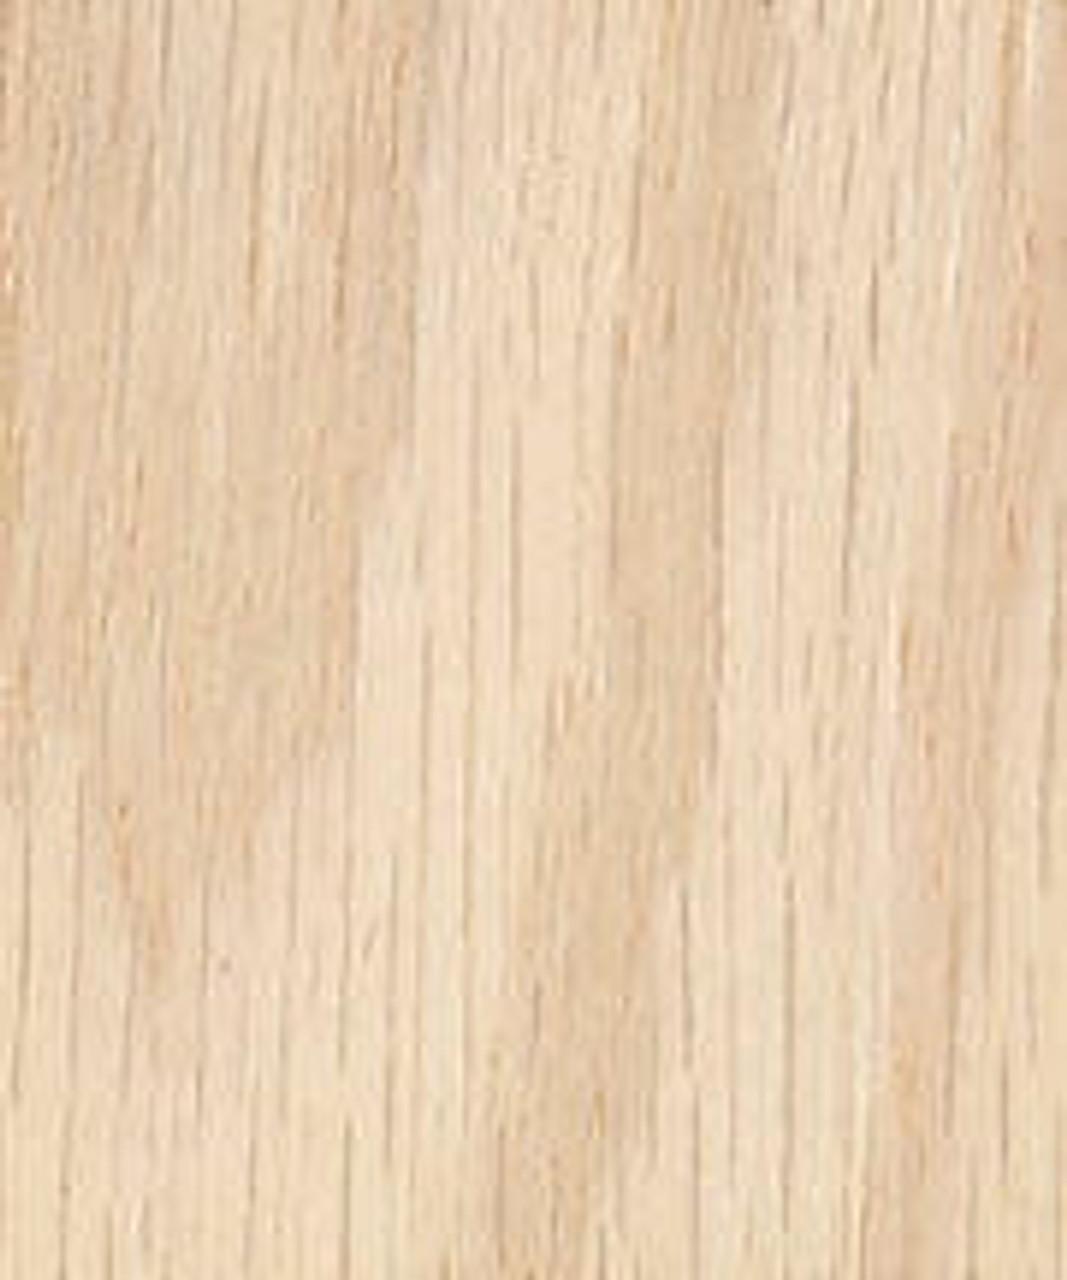 Cherry Tree Toys 1/4 Veneer Core Oak Plywood